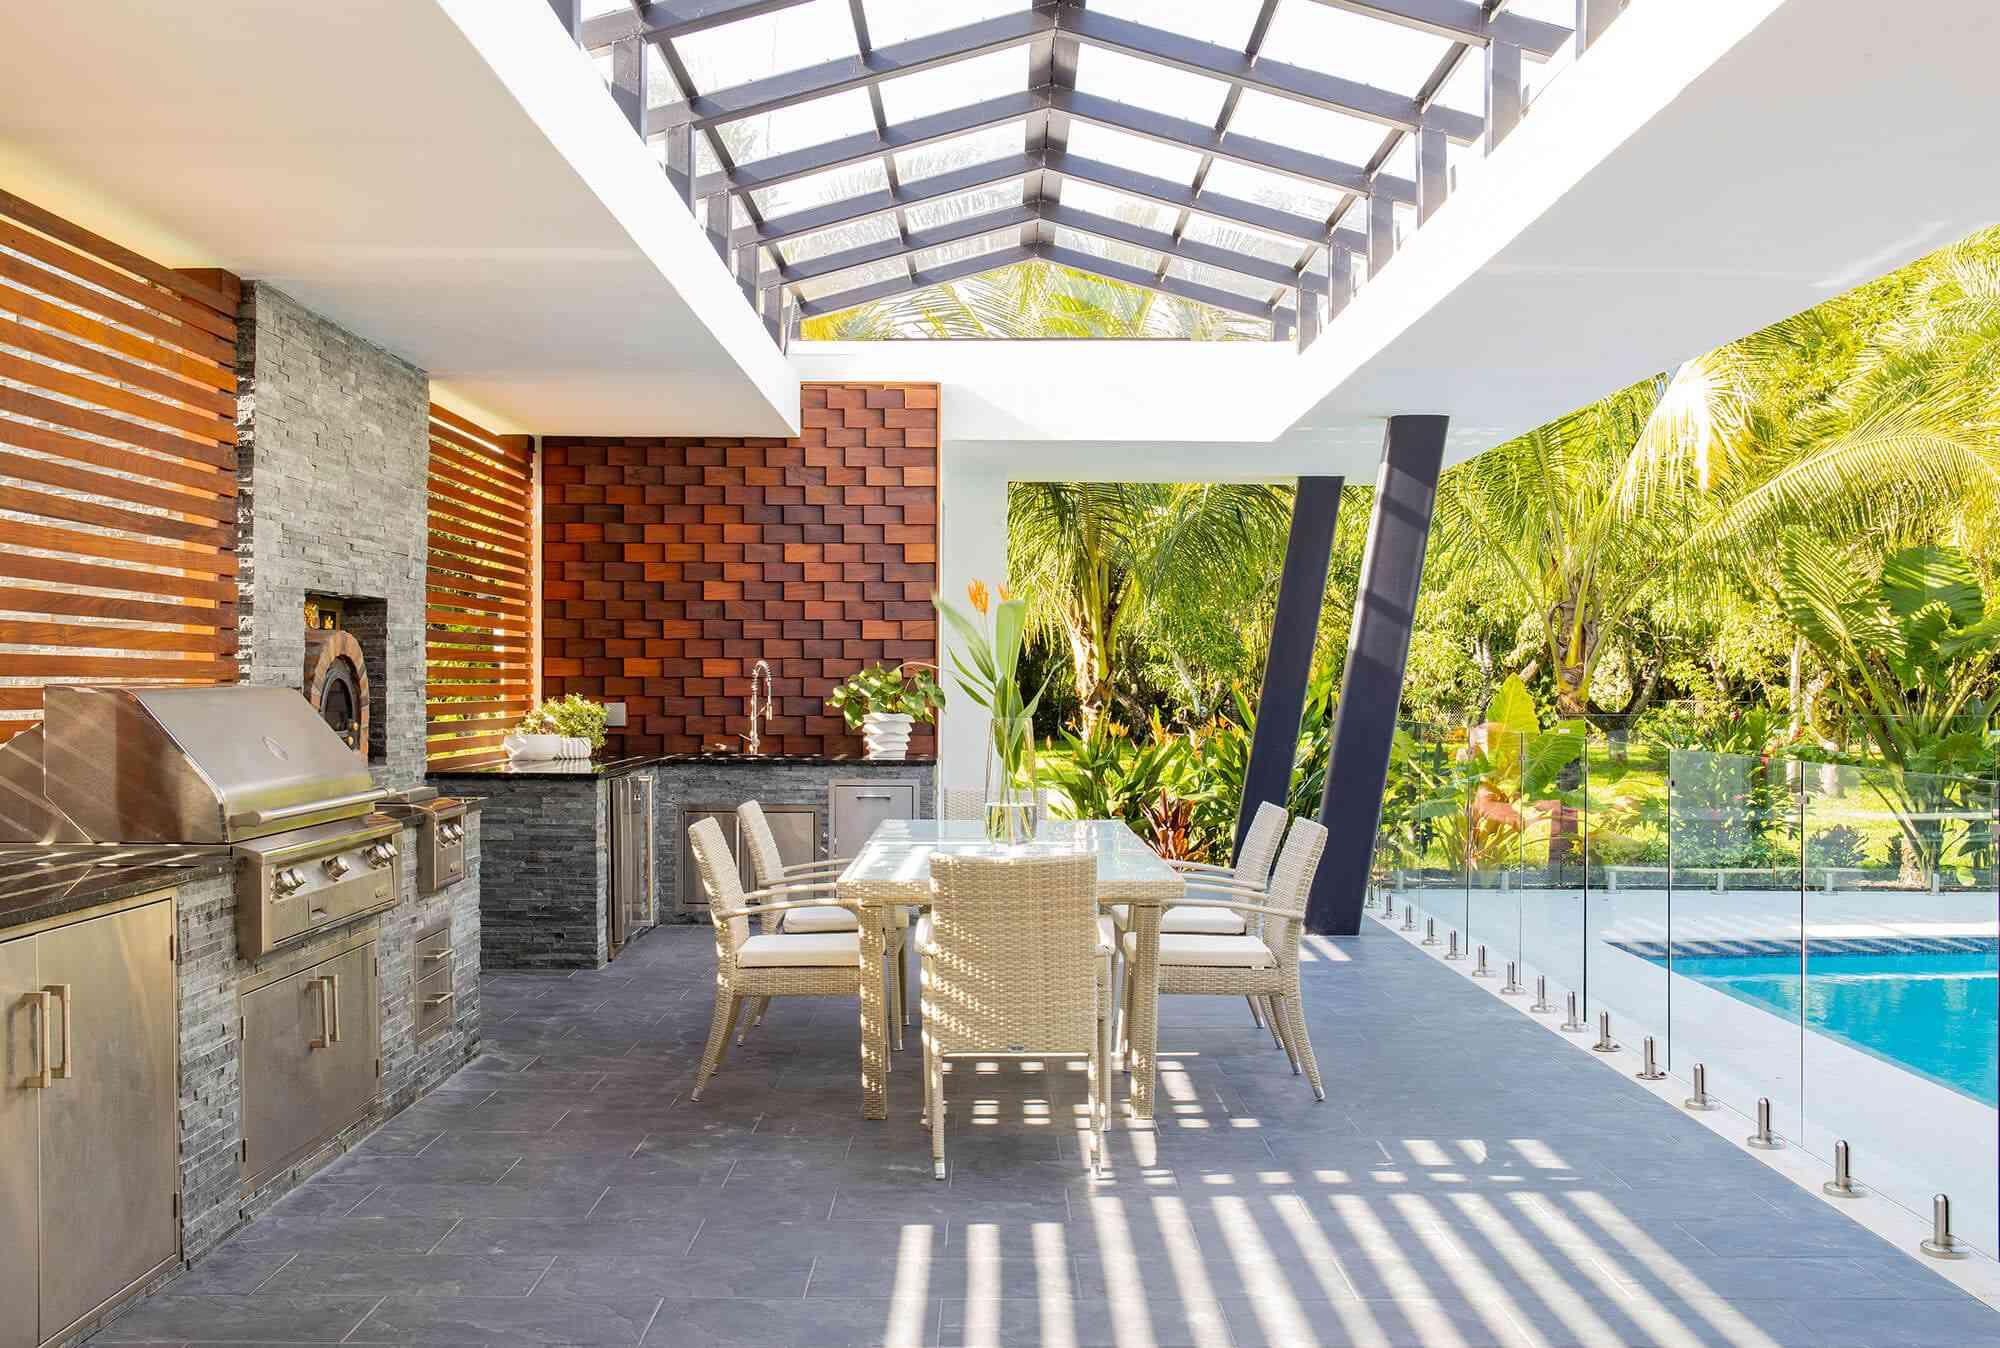 Maite Granda outdoor backyard with pool.